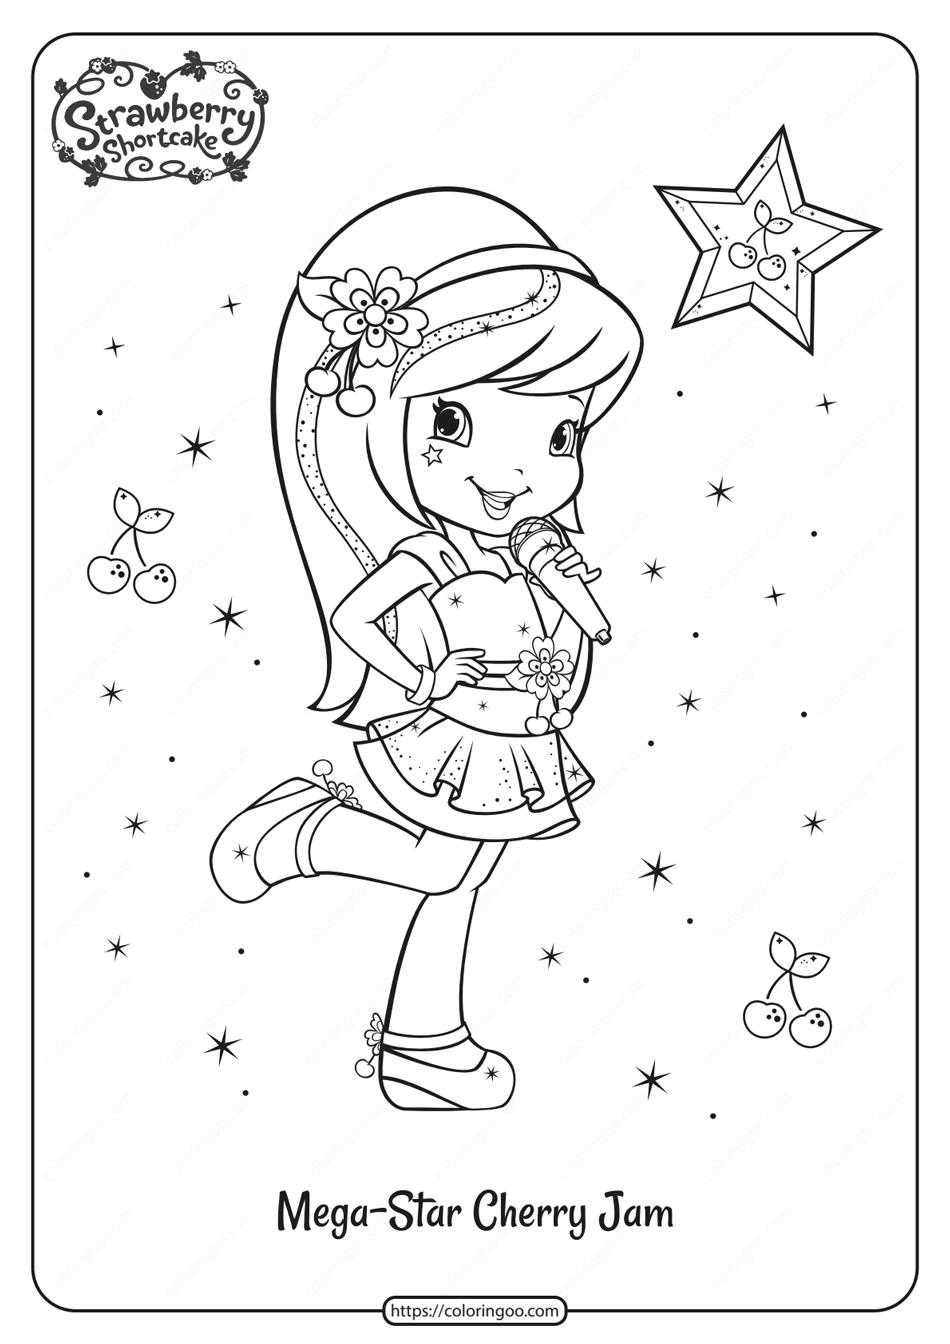 Free Printable Megastar Cherry Jam Coloring Page Strawberry Shortcake Coloring Pages Strawberry Shortcake Cartoon Coloring Pictures